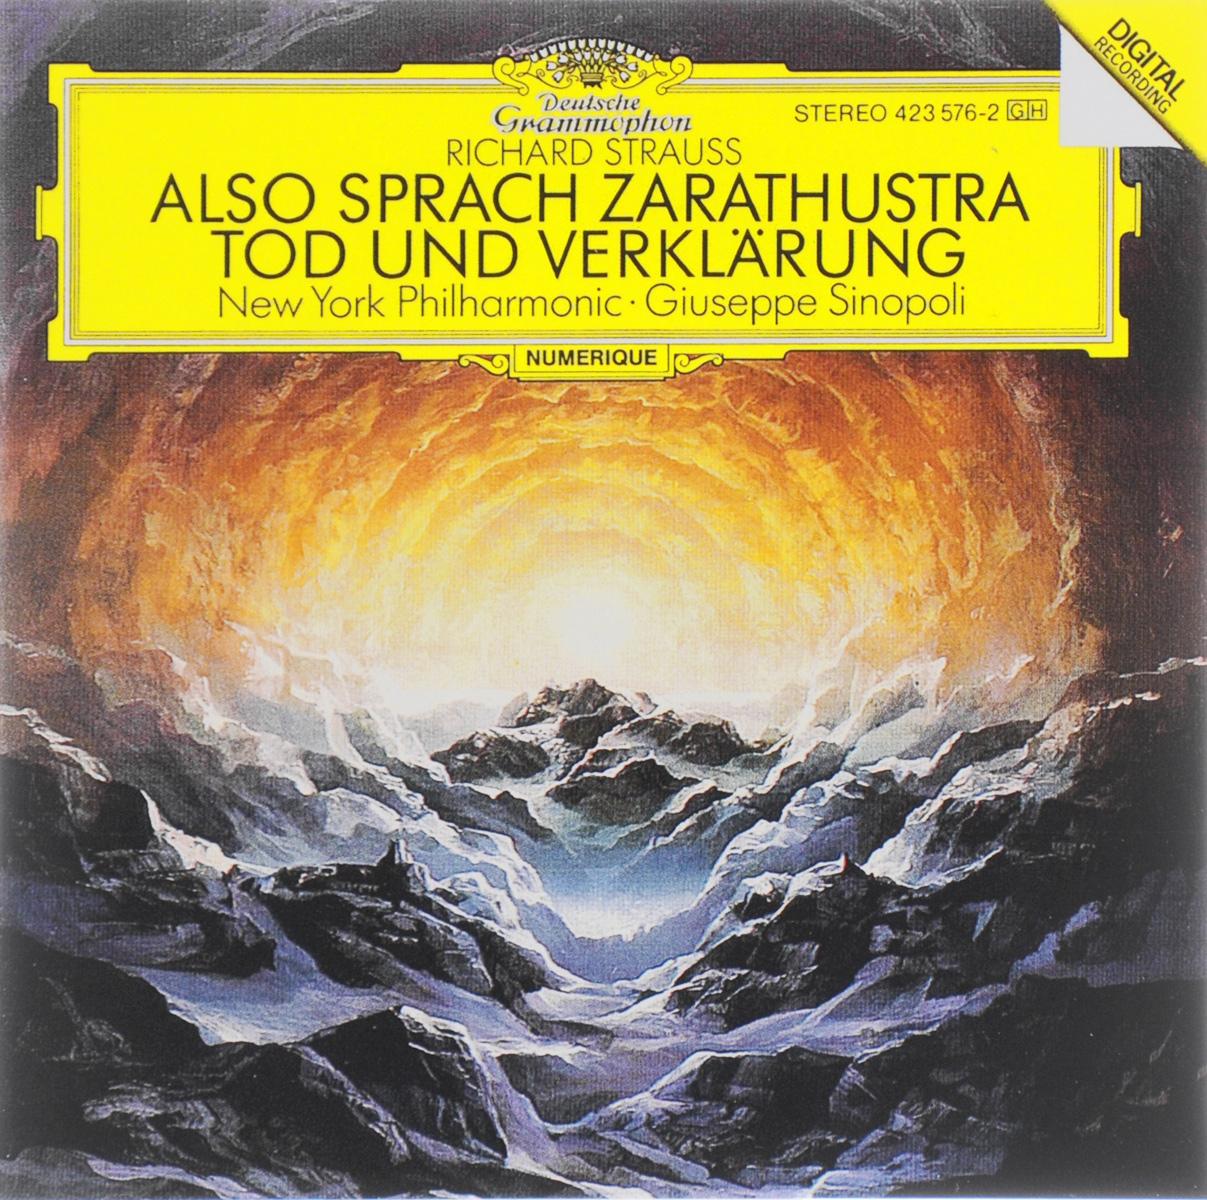 цена Джузеппе Синополи,New York Philharmonic Orchestra Giuseppe Sinopoli. Richard Strauss. Also Sprach Zaratustra / Tod Und Verklarung онлайн в 2017 году